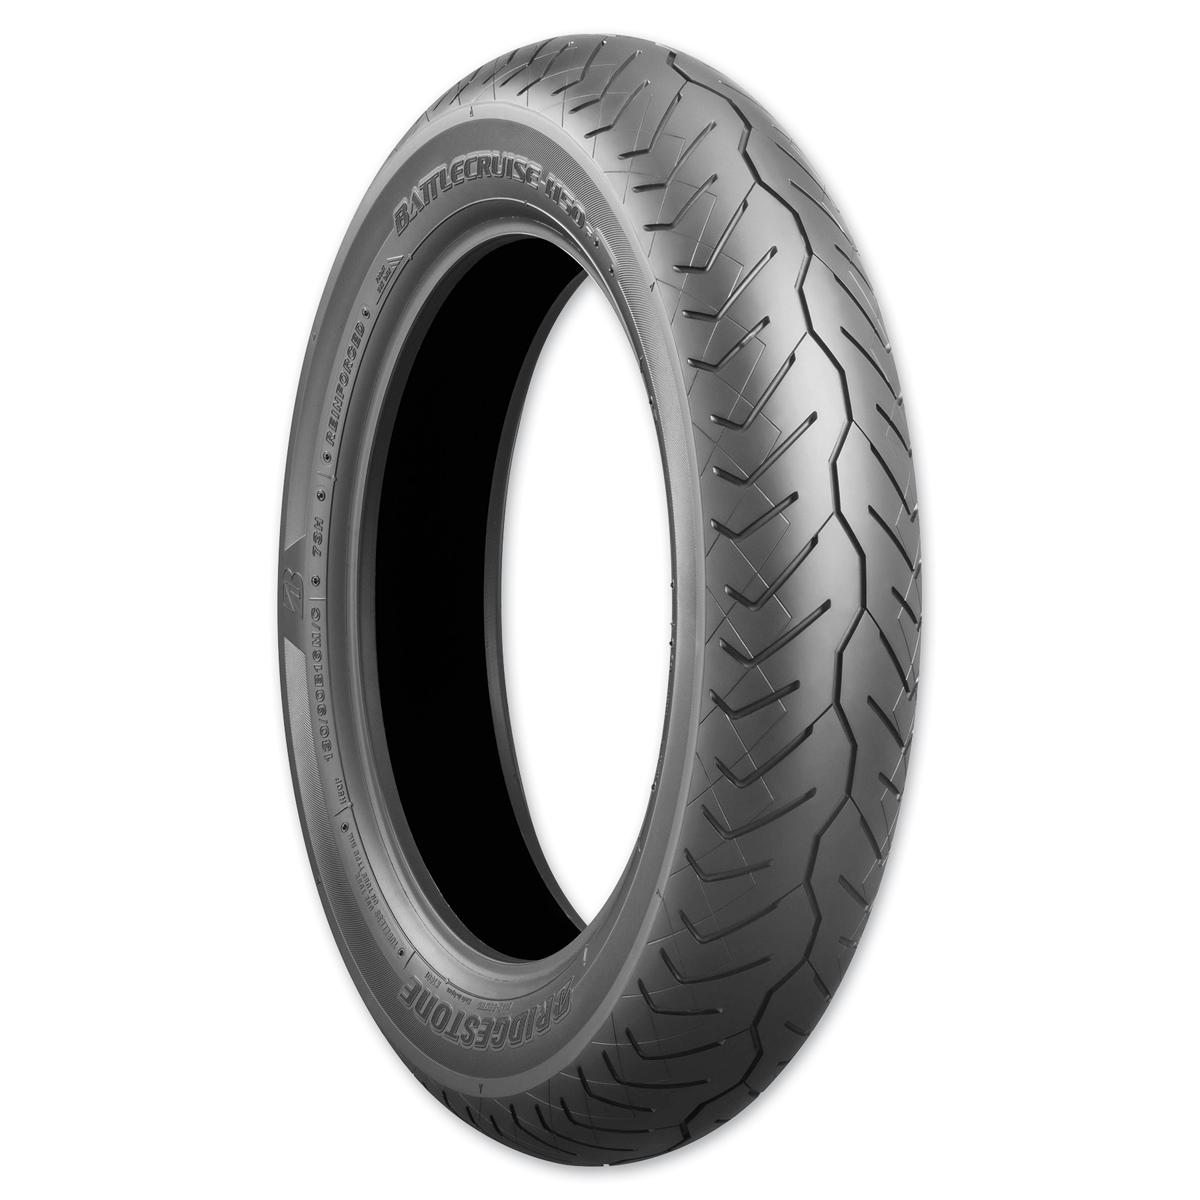 Bridgestone Battlecruise H50 80/90-21 Front Tire